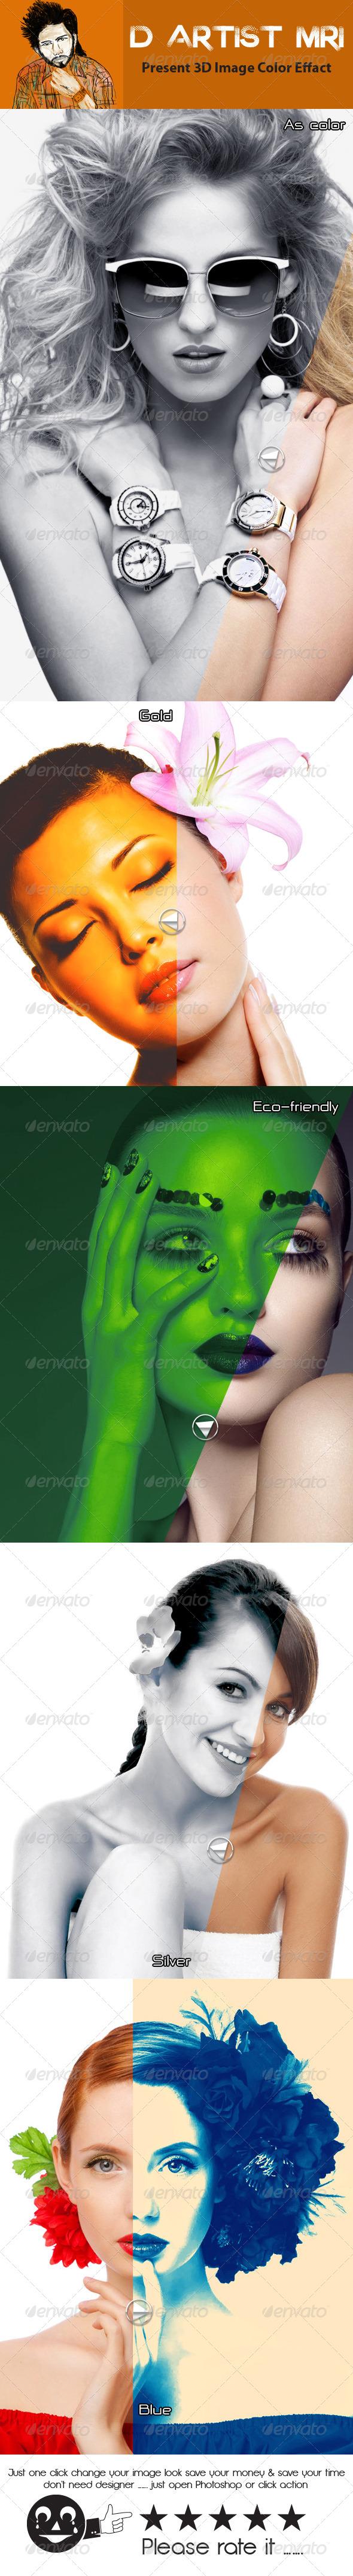 GraphicRiver Premium Color Action 8183318